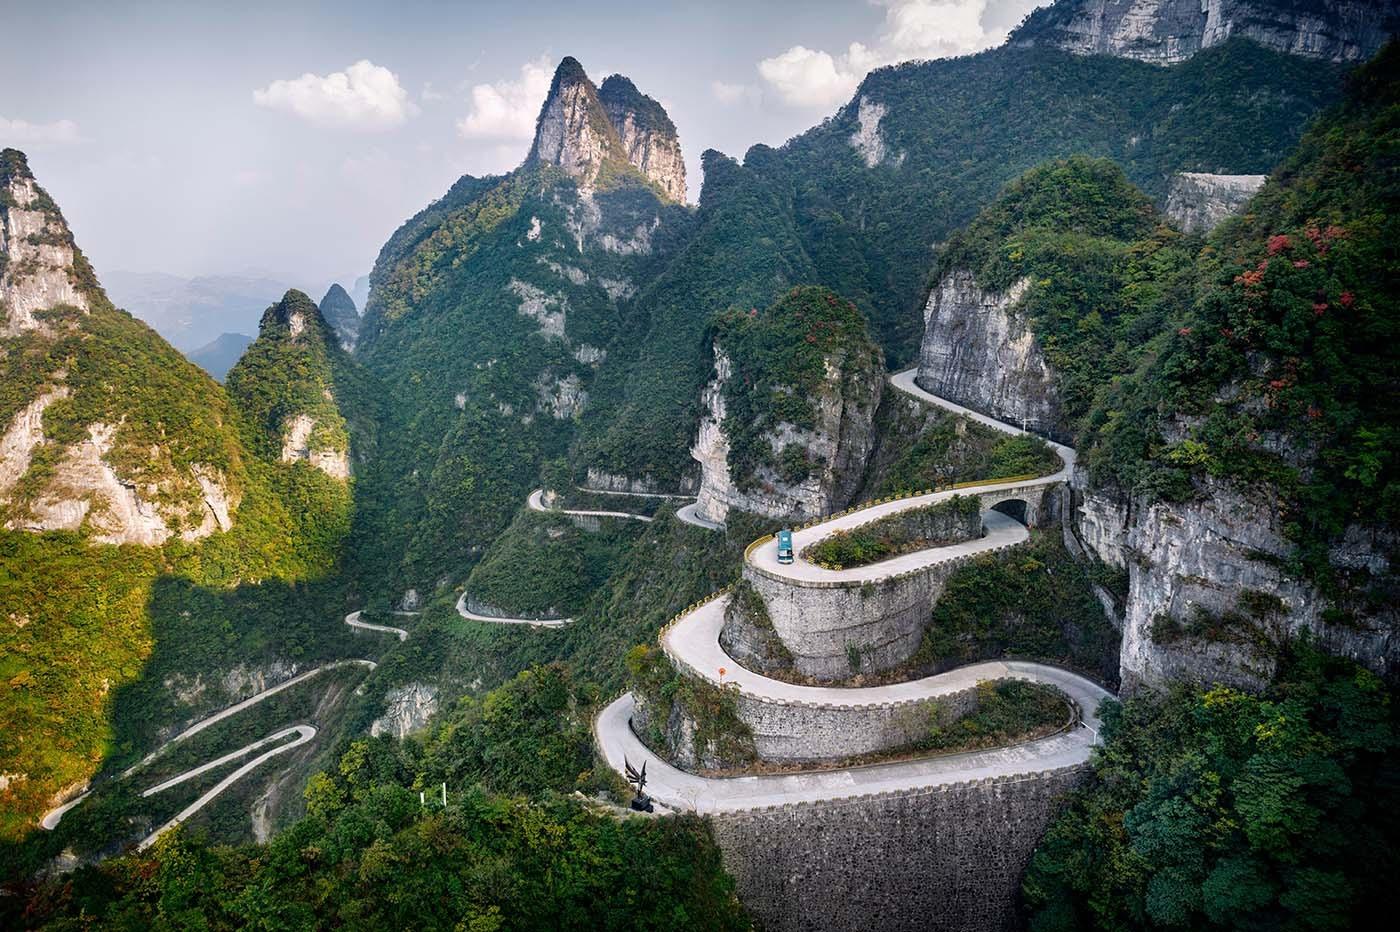 China: Maravillas y Parques Naturales